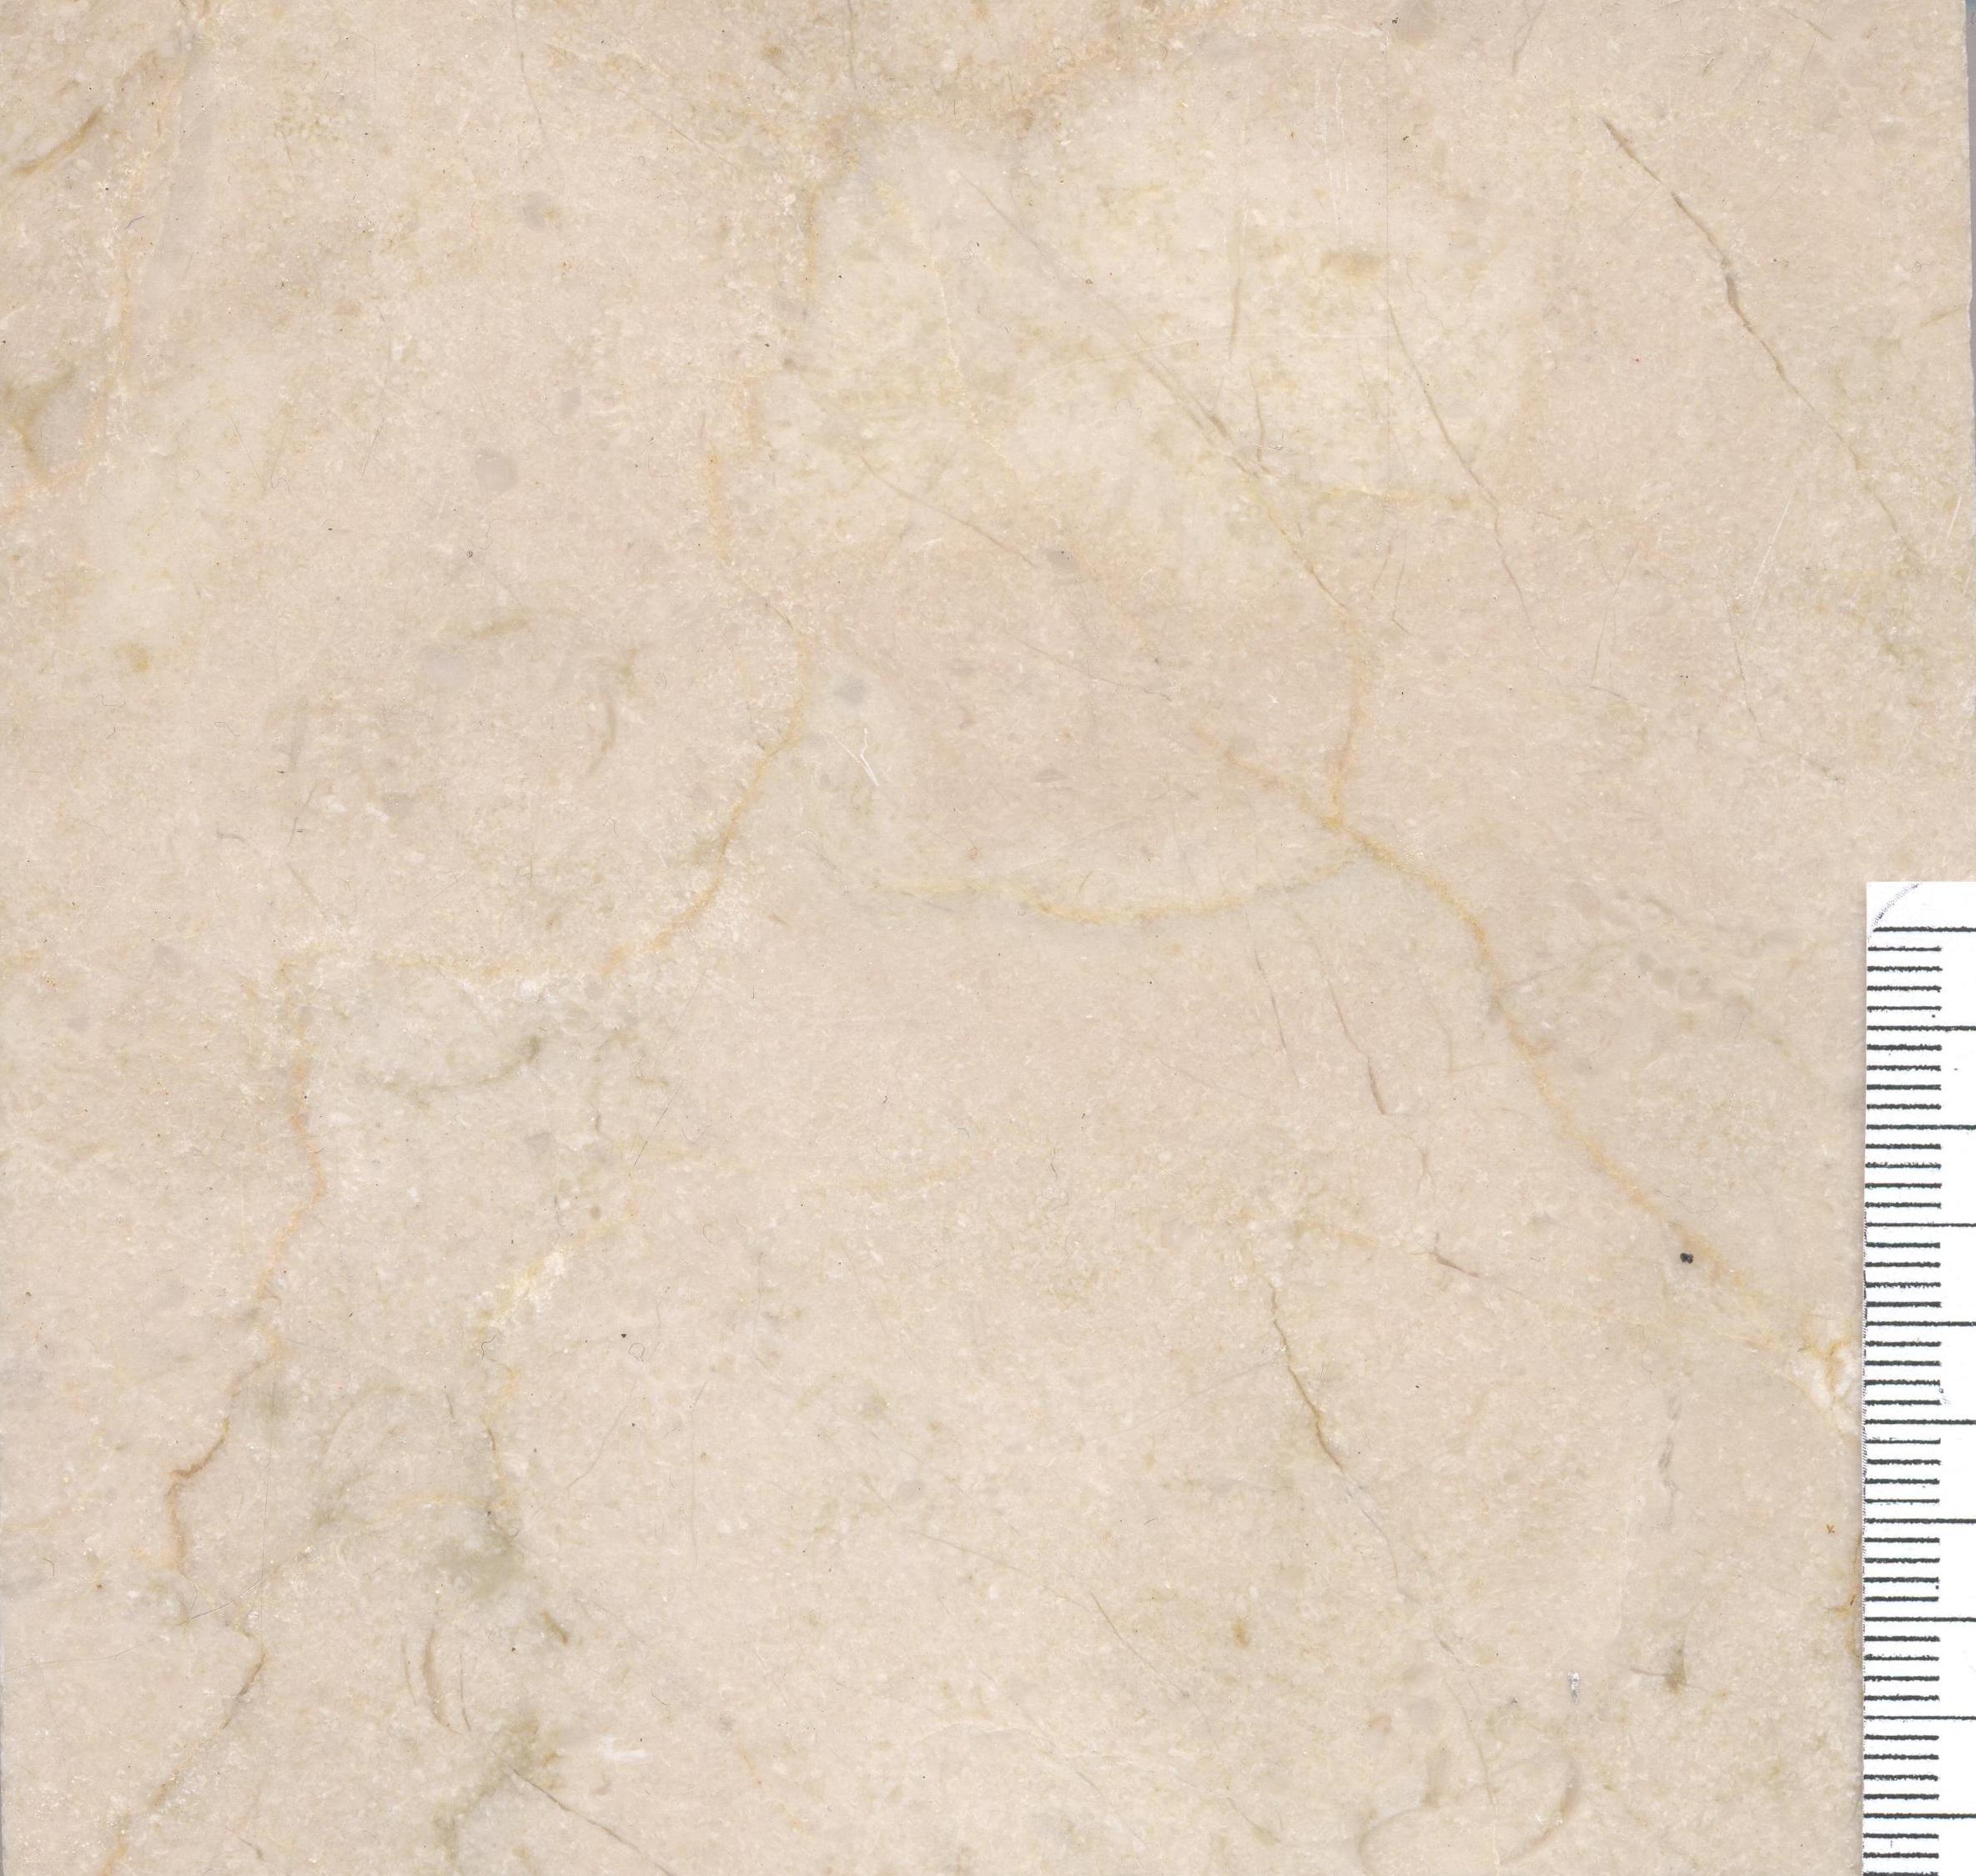 Crema Marfil M1338